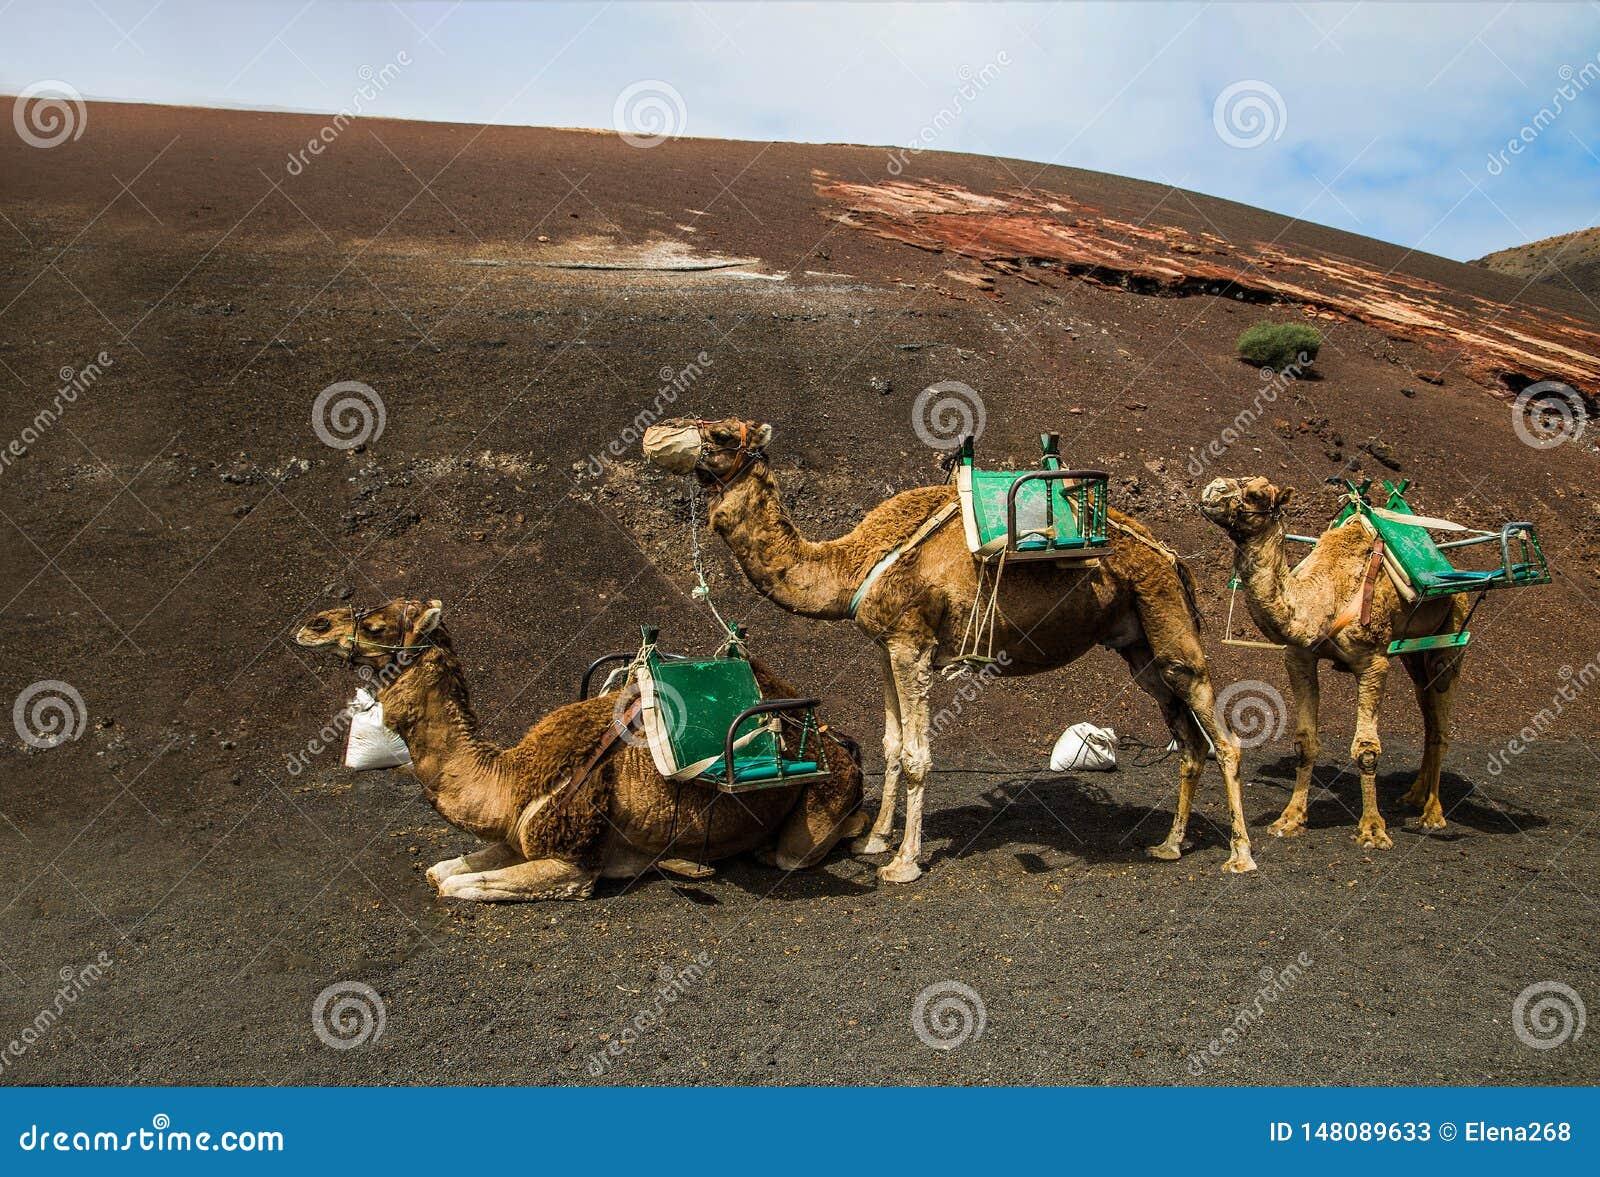 Smal husvagn p? den bruna sanden